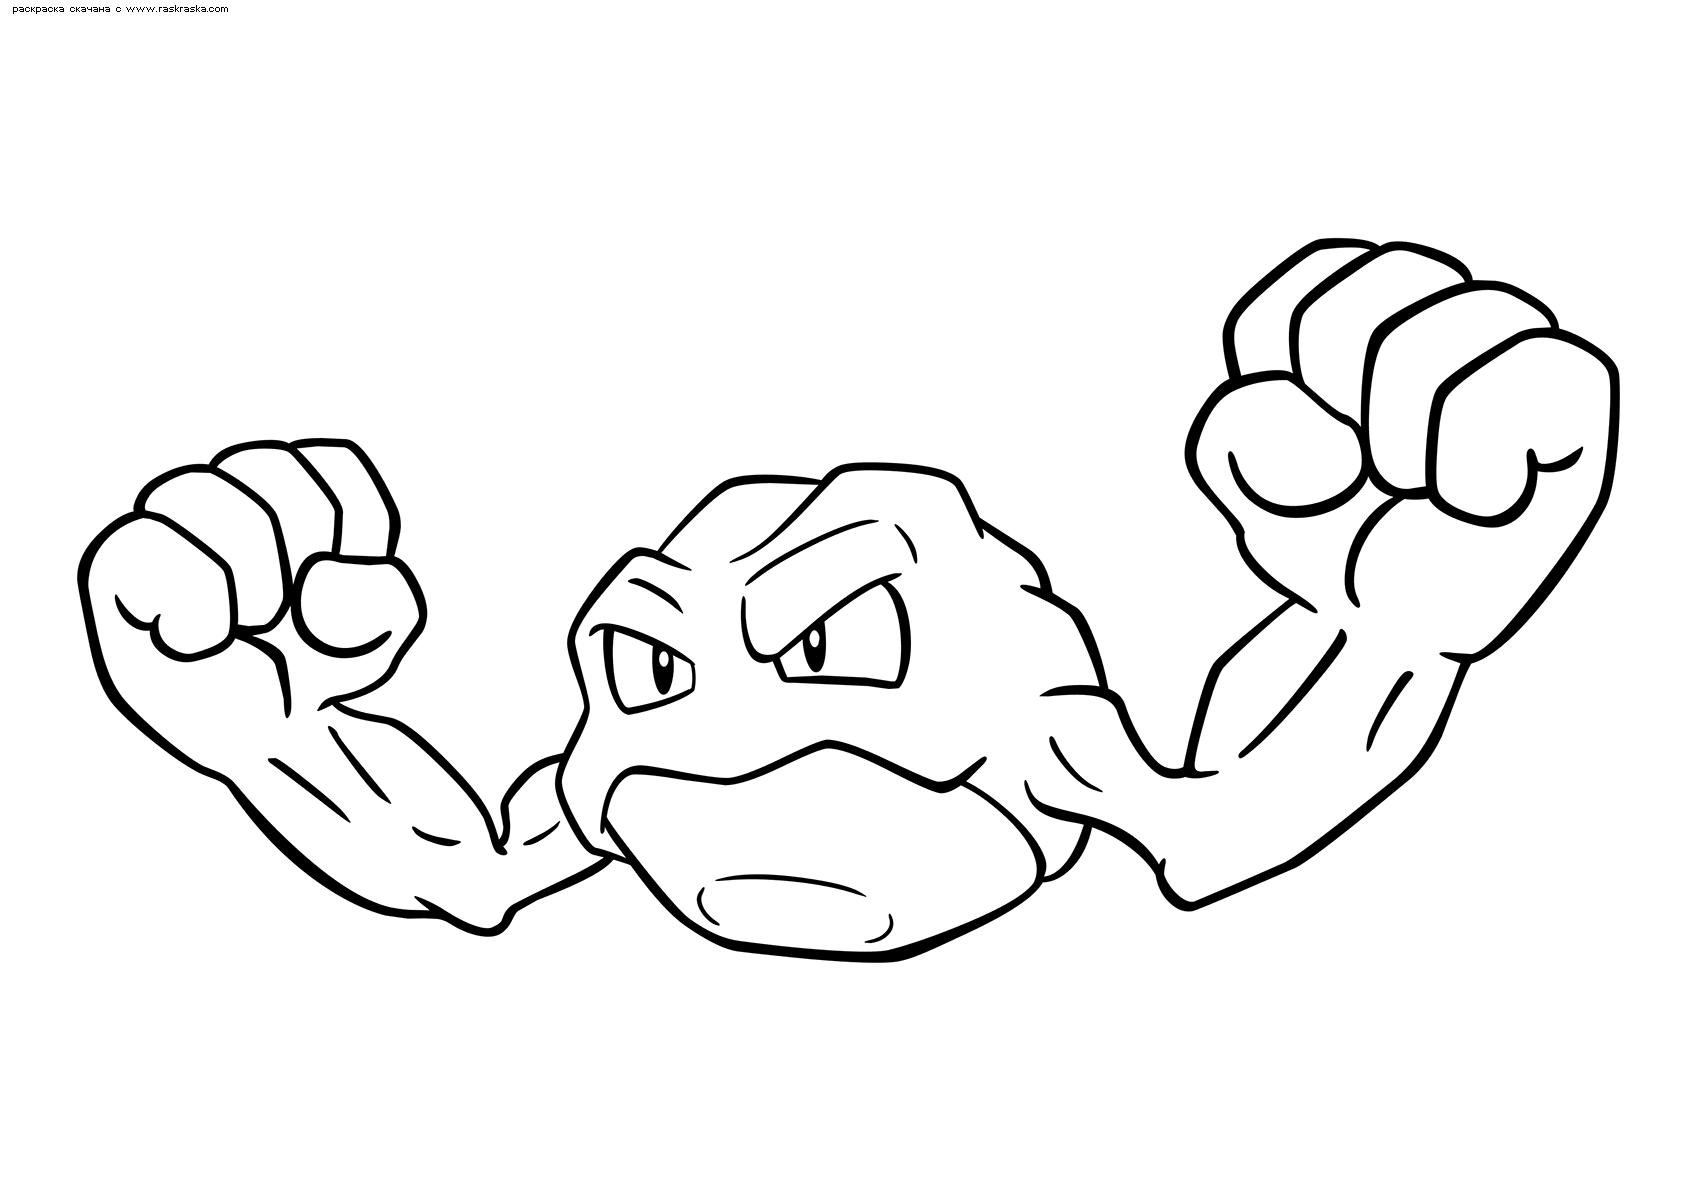 Раскраска Покемон Джеодуд (Geodude) | Раскраски эволюция ...